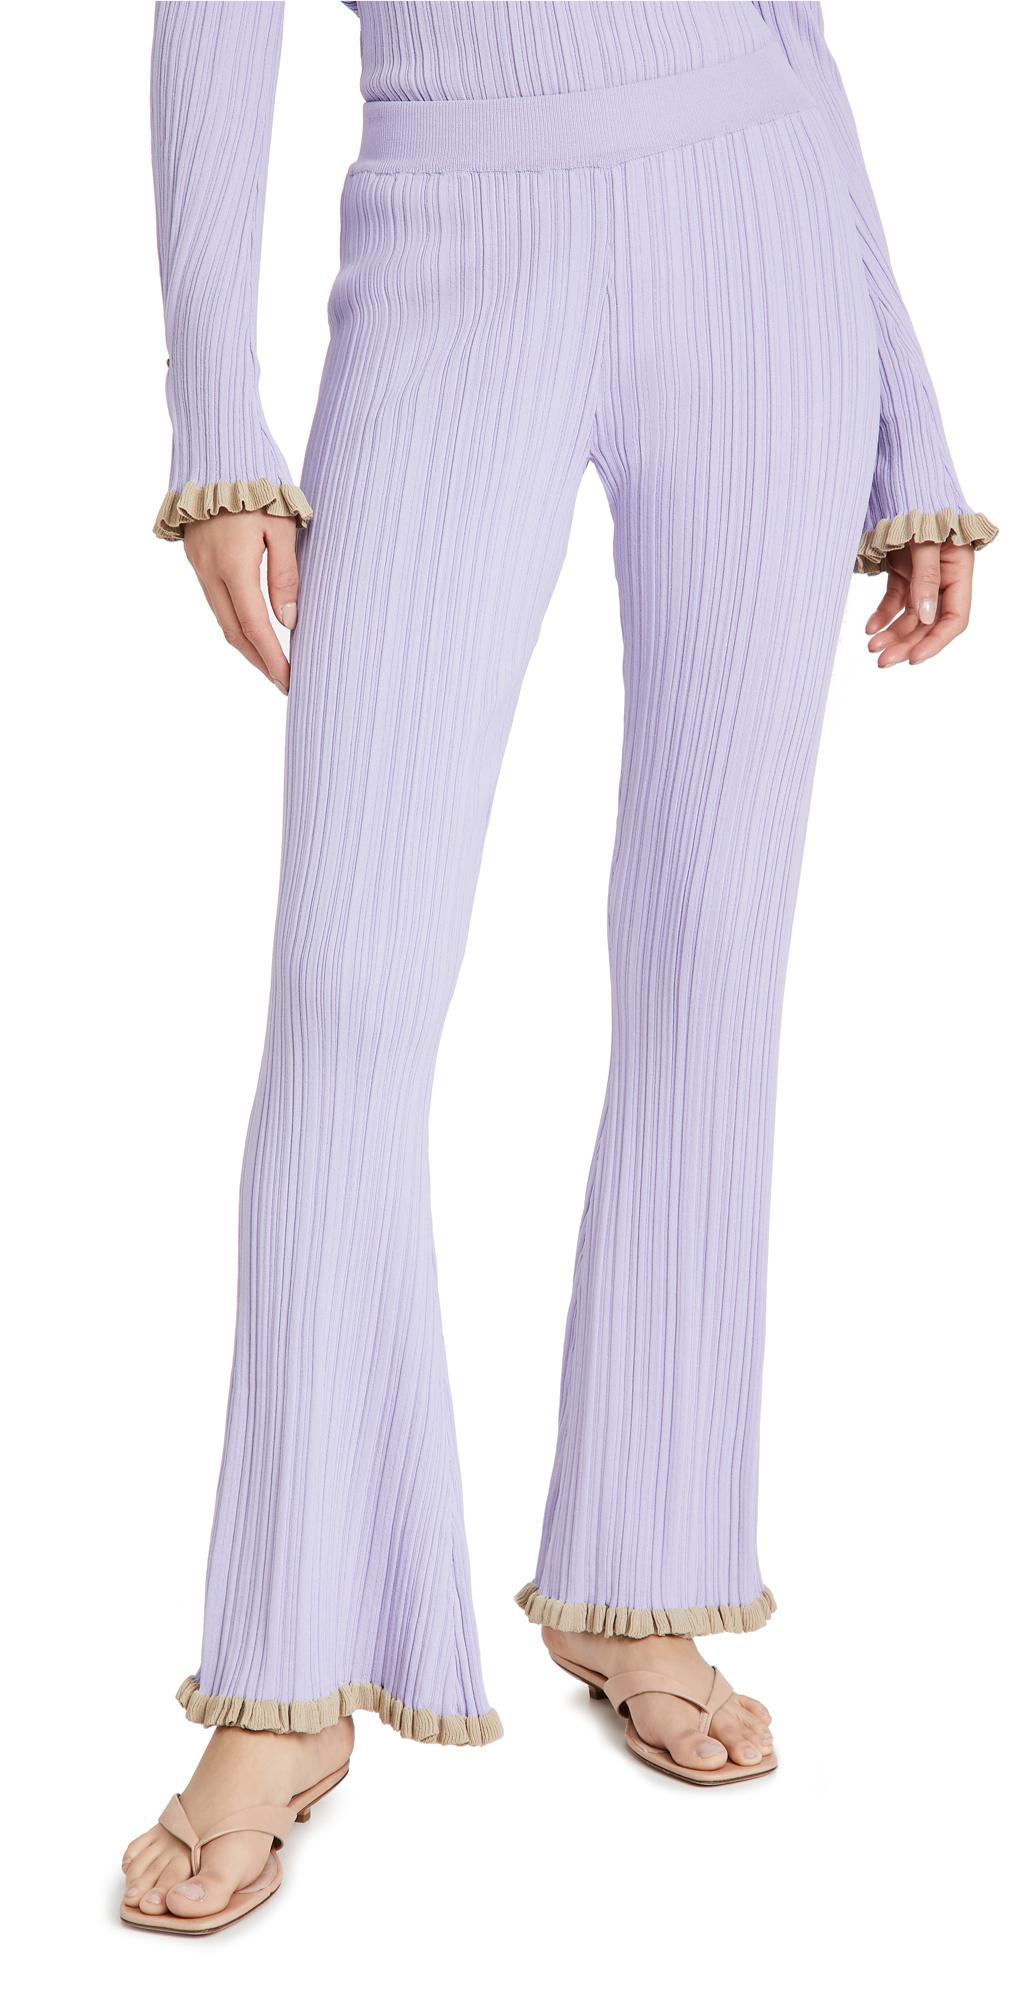 Dahlia Knit Trousers